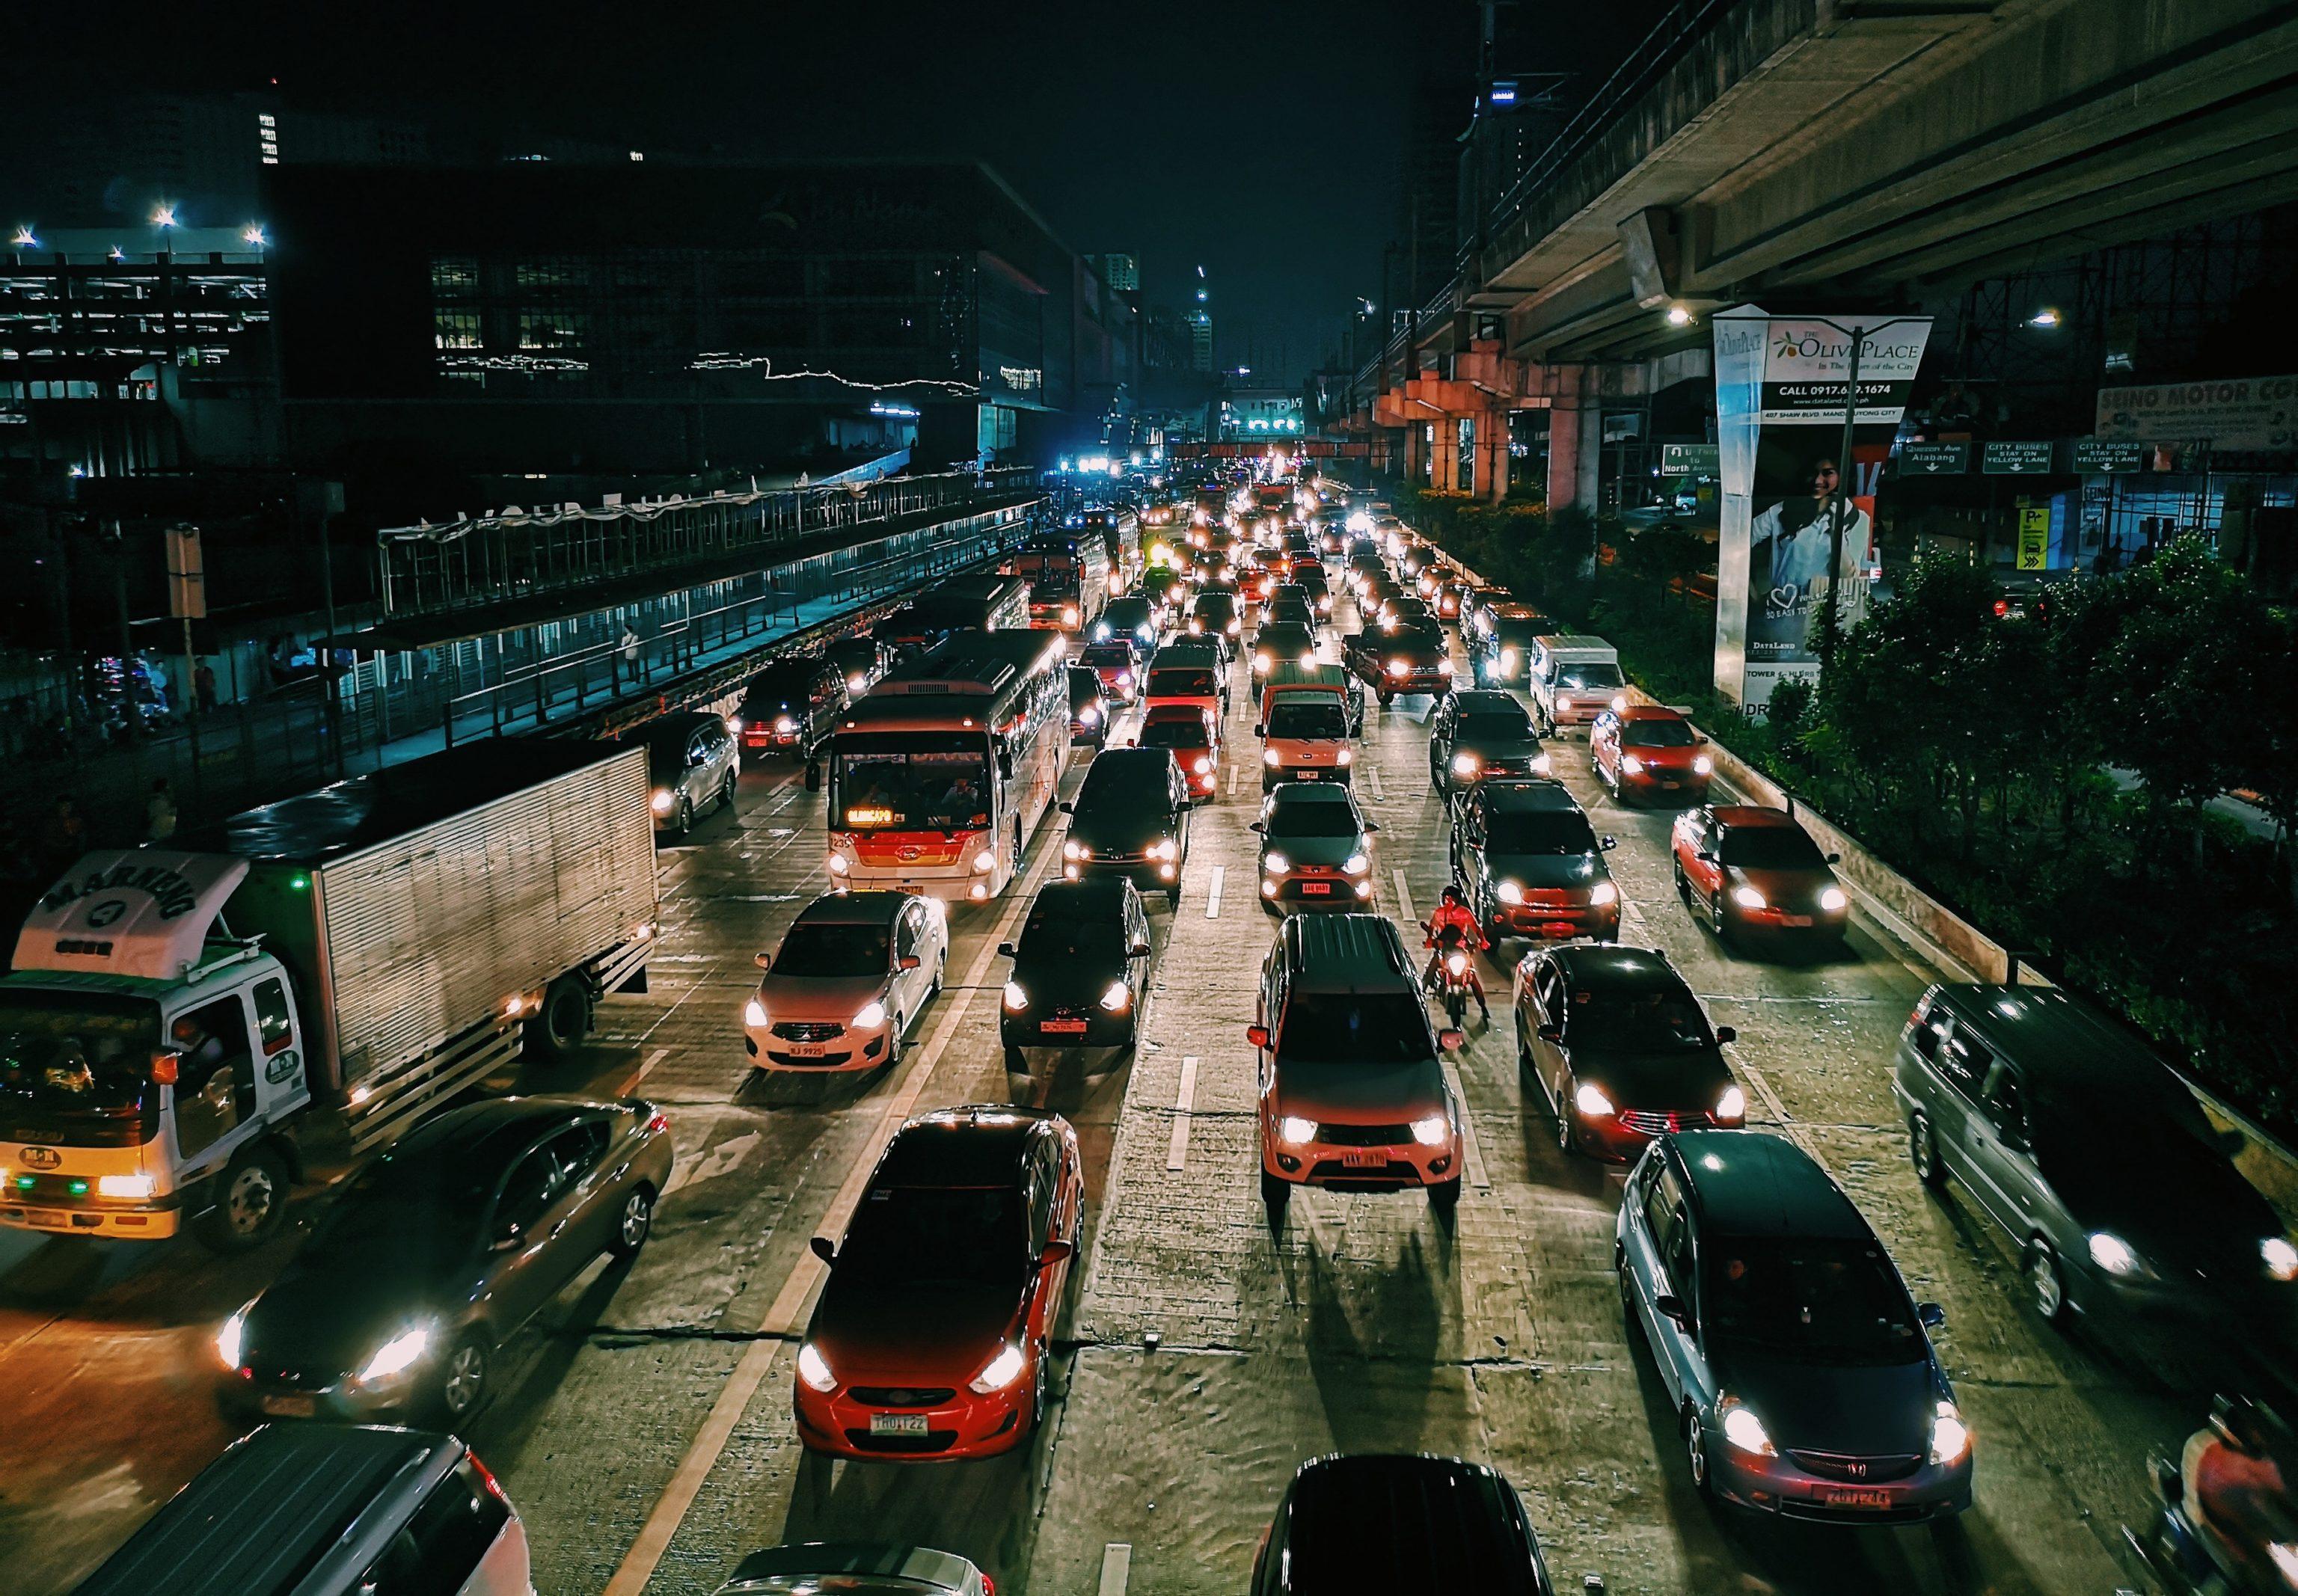 Waspada traffic arah ke AEON Mall BSD